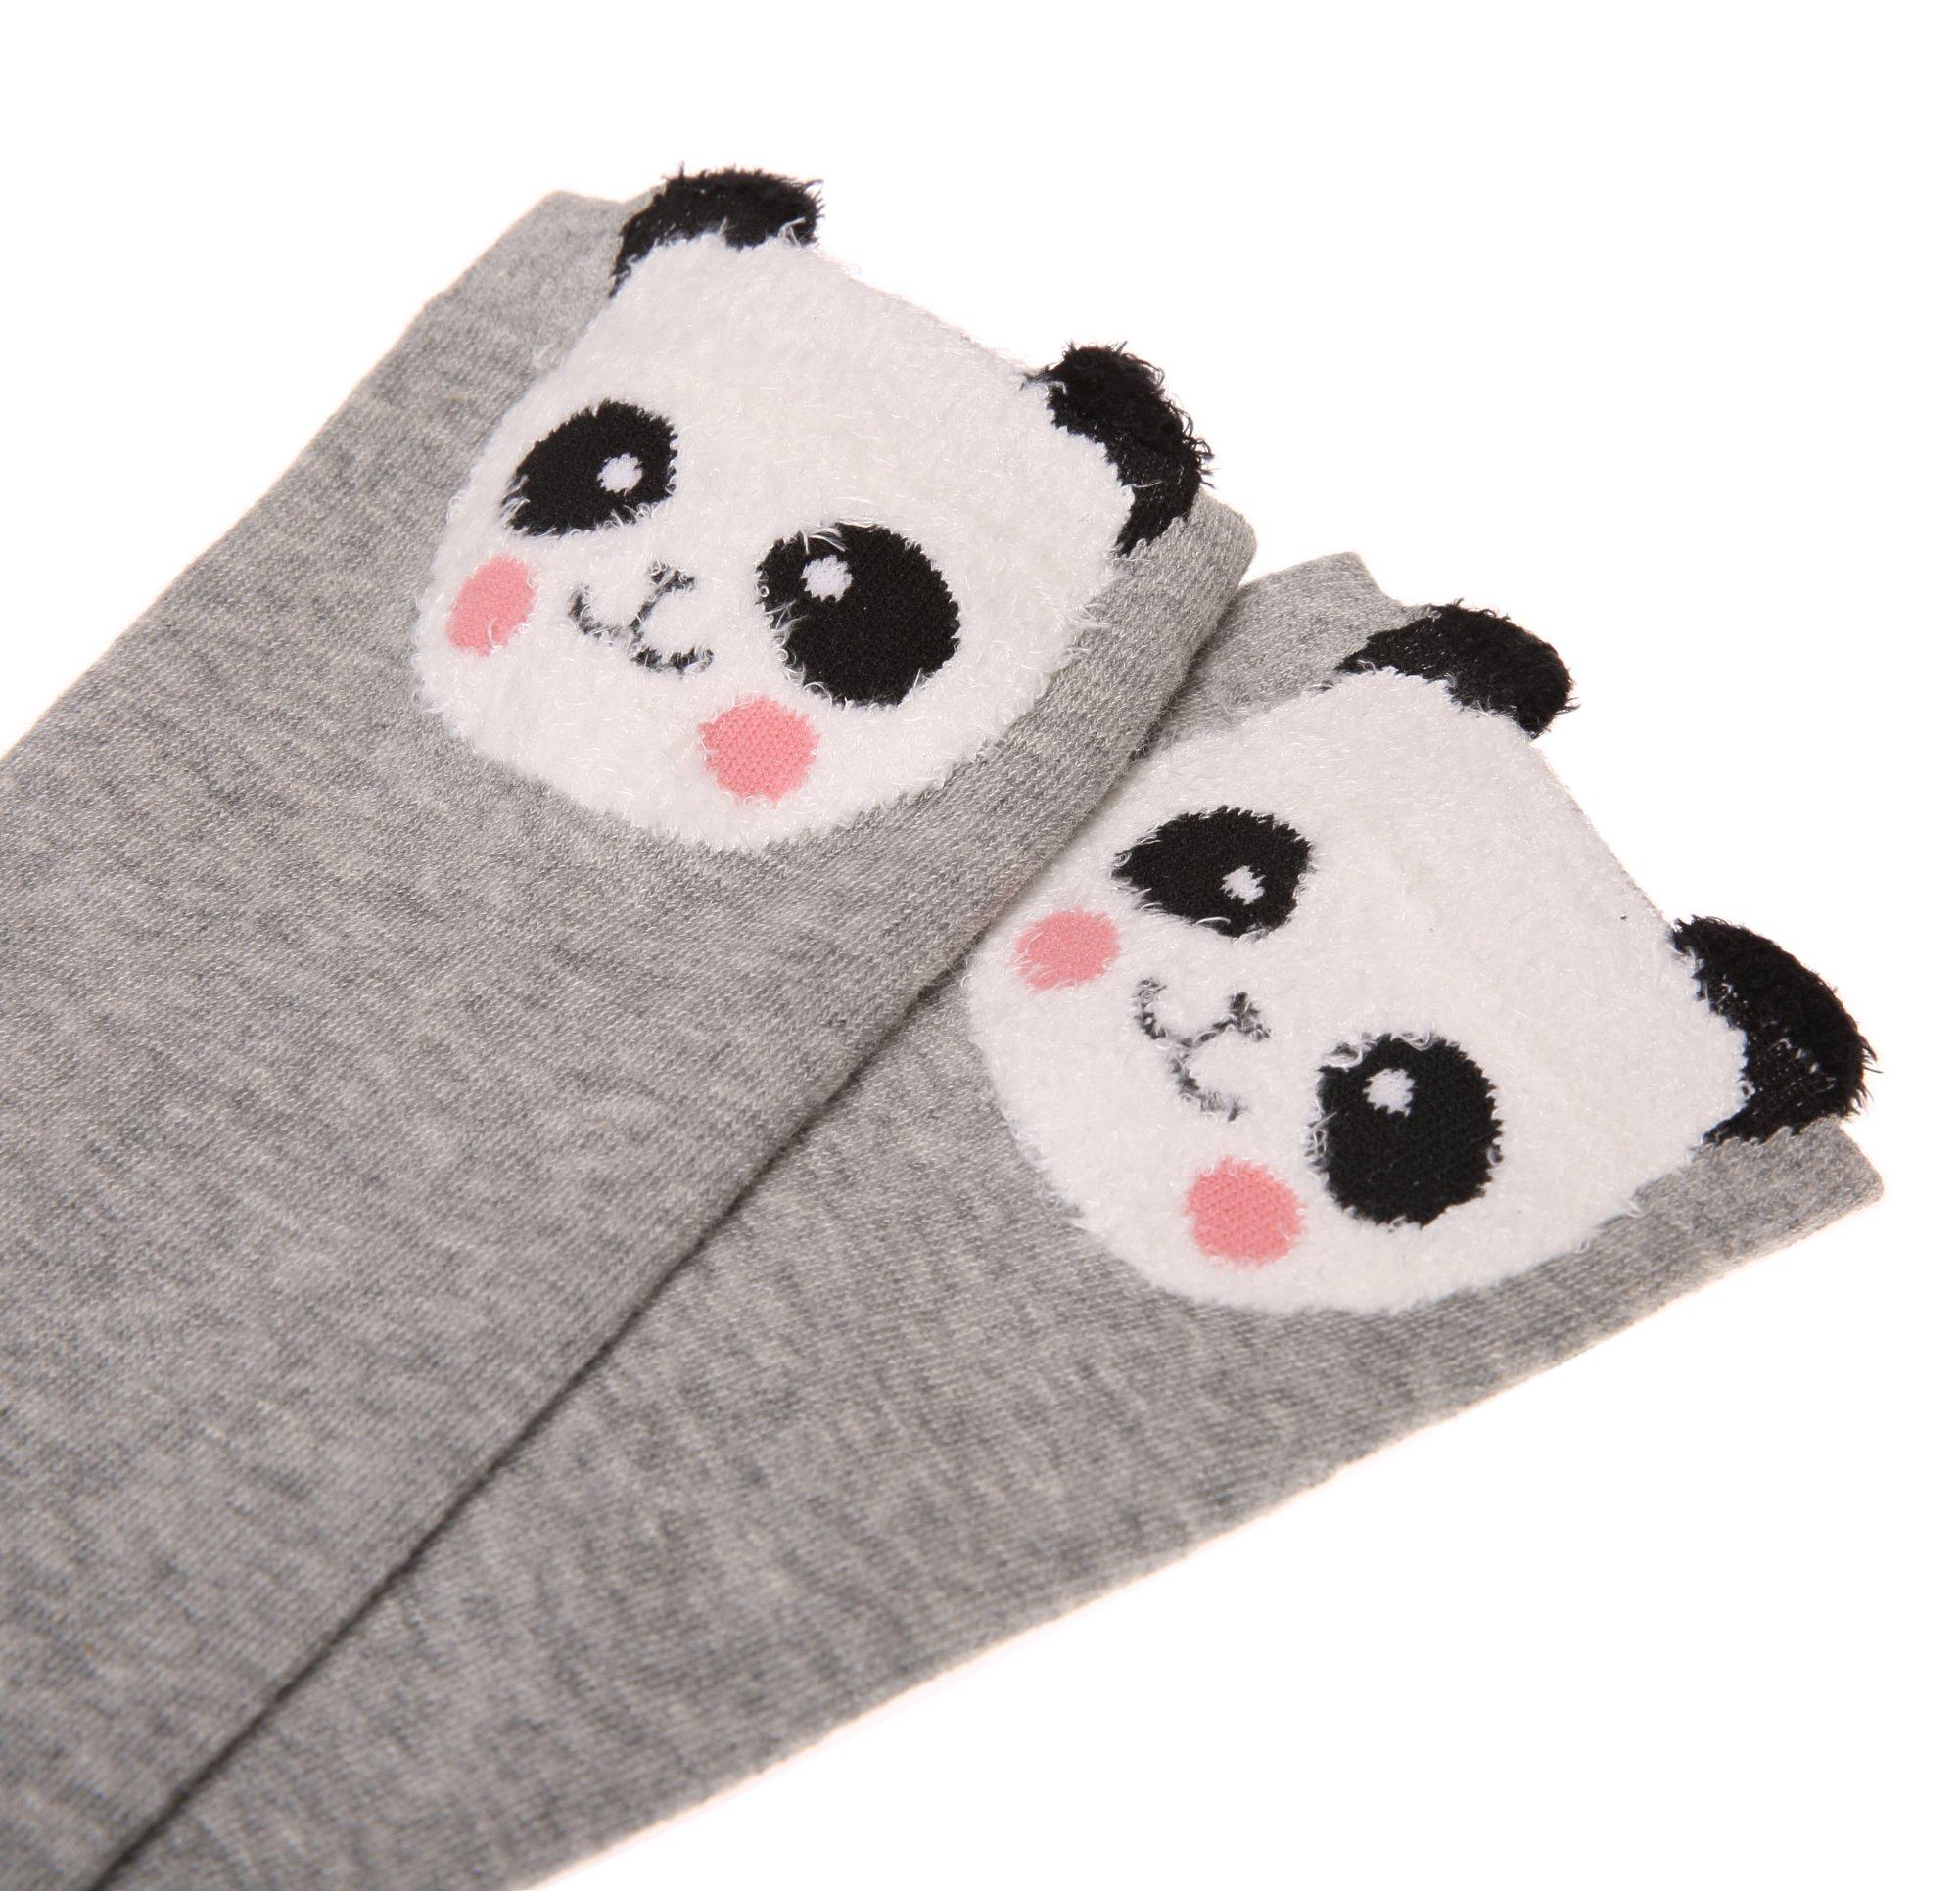 Color City Kids Girls Socks Knee High Stockings Cartoon Animal Theme Cotton Socks (6 Pairs) by Color City (Image #5)